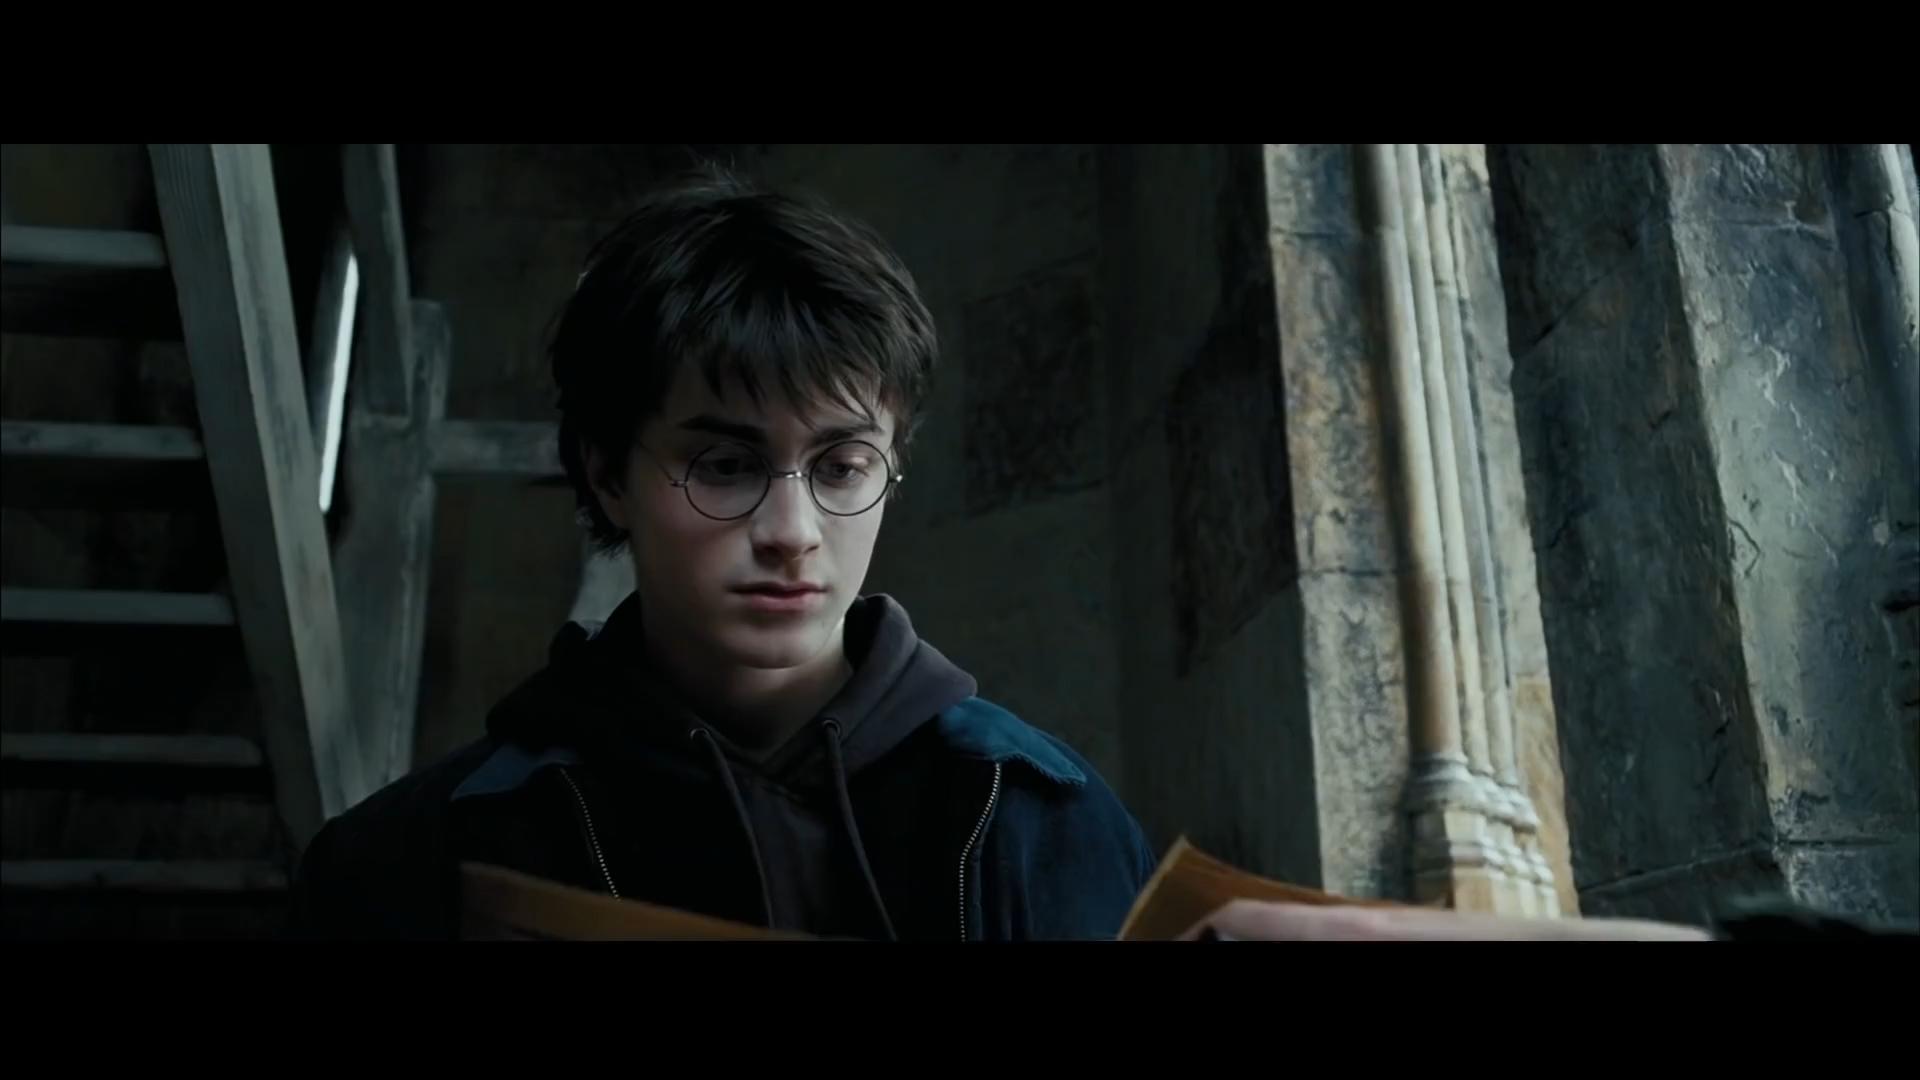 [2] Harry Potter and the Prisoner of Azkaban - The Marauder's Map